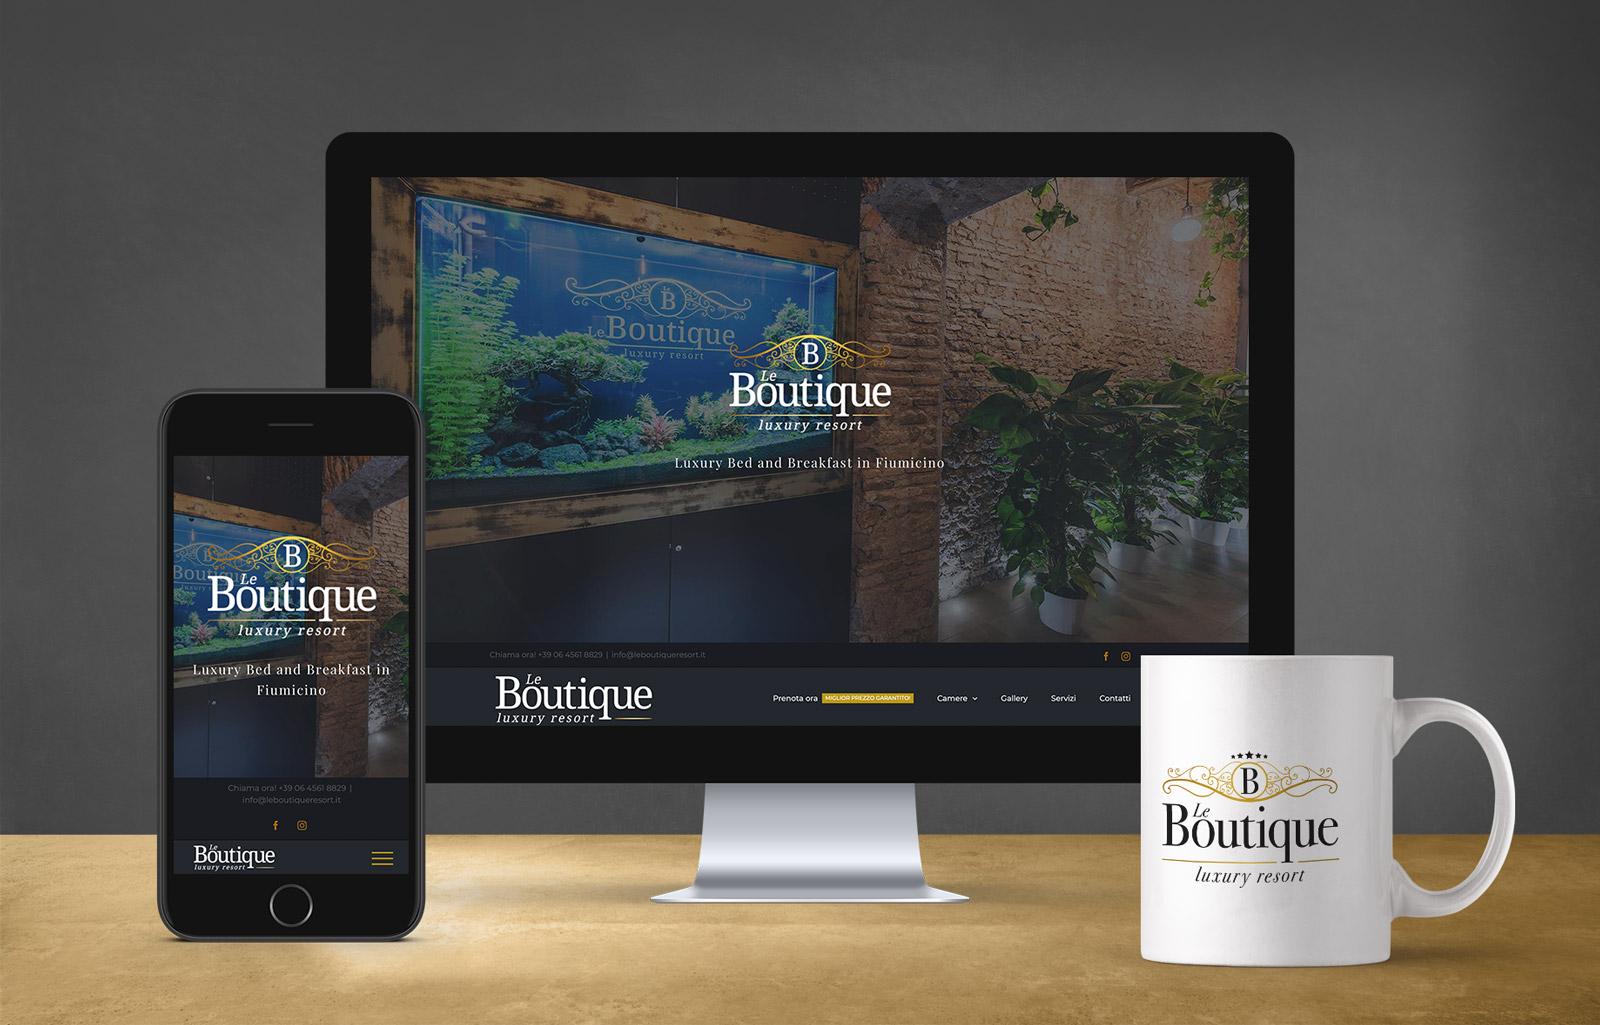 website bed and breakfast le boutique luxury resort Diego Favaretto Web designer